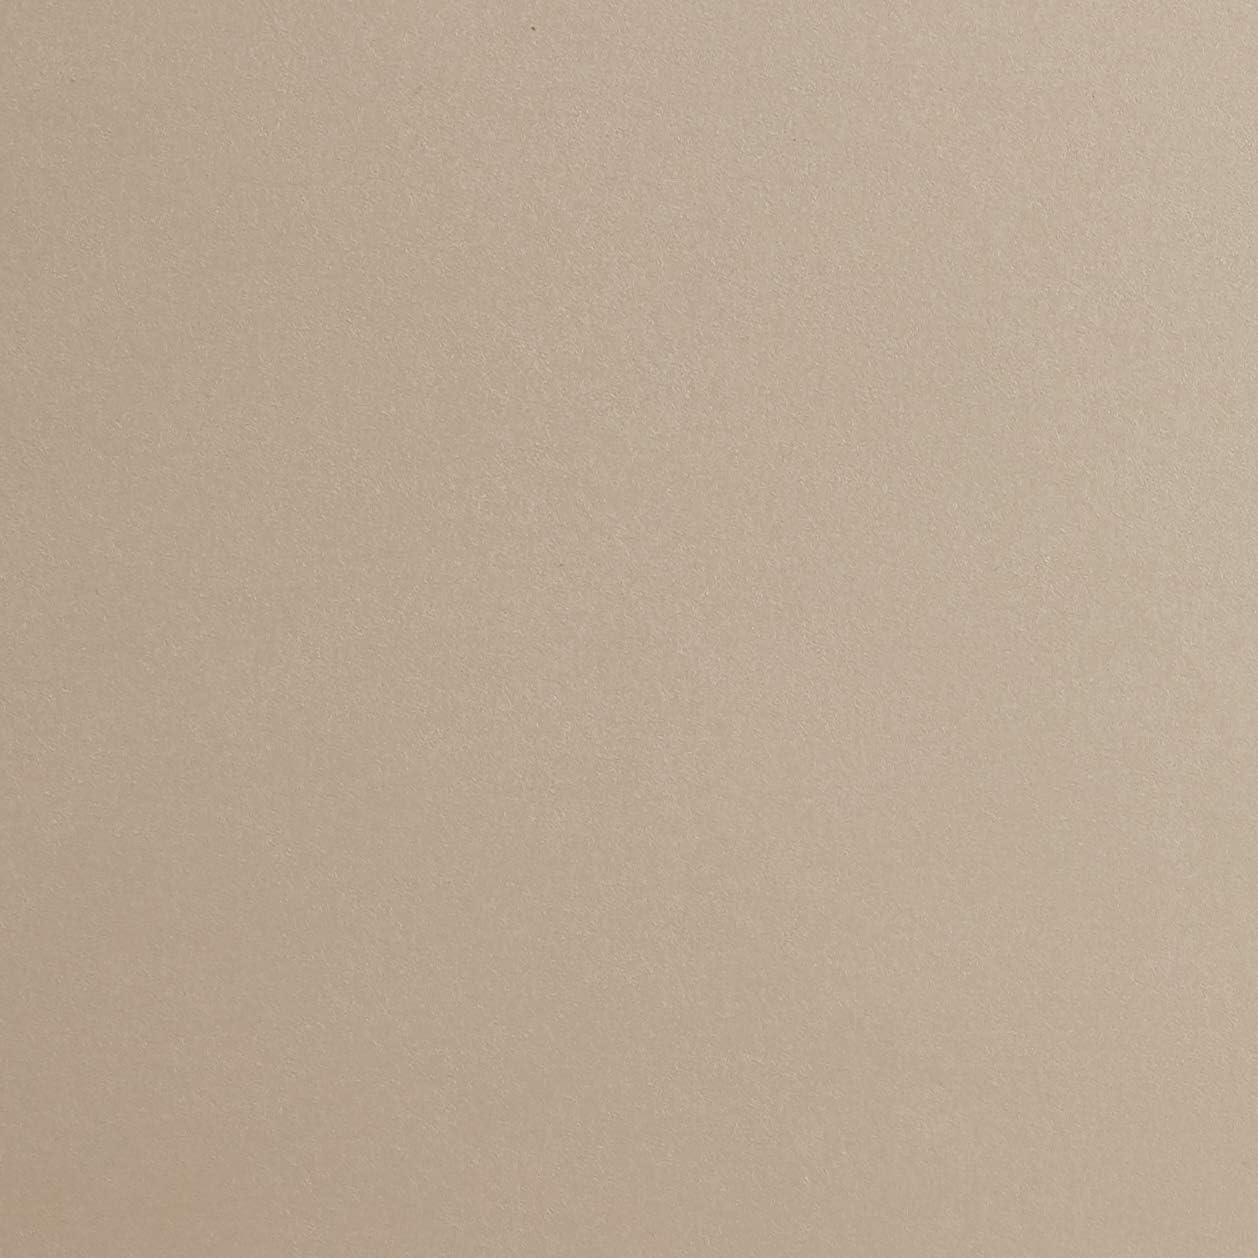 Tablero DM, 50 x 22,8 x 3,4 cm Color Roble Claro 50 x 22,8 x 3,4 cm Tablero//Madera DM ModulHome 6RAN791BC Estanter/ía para Colgar